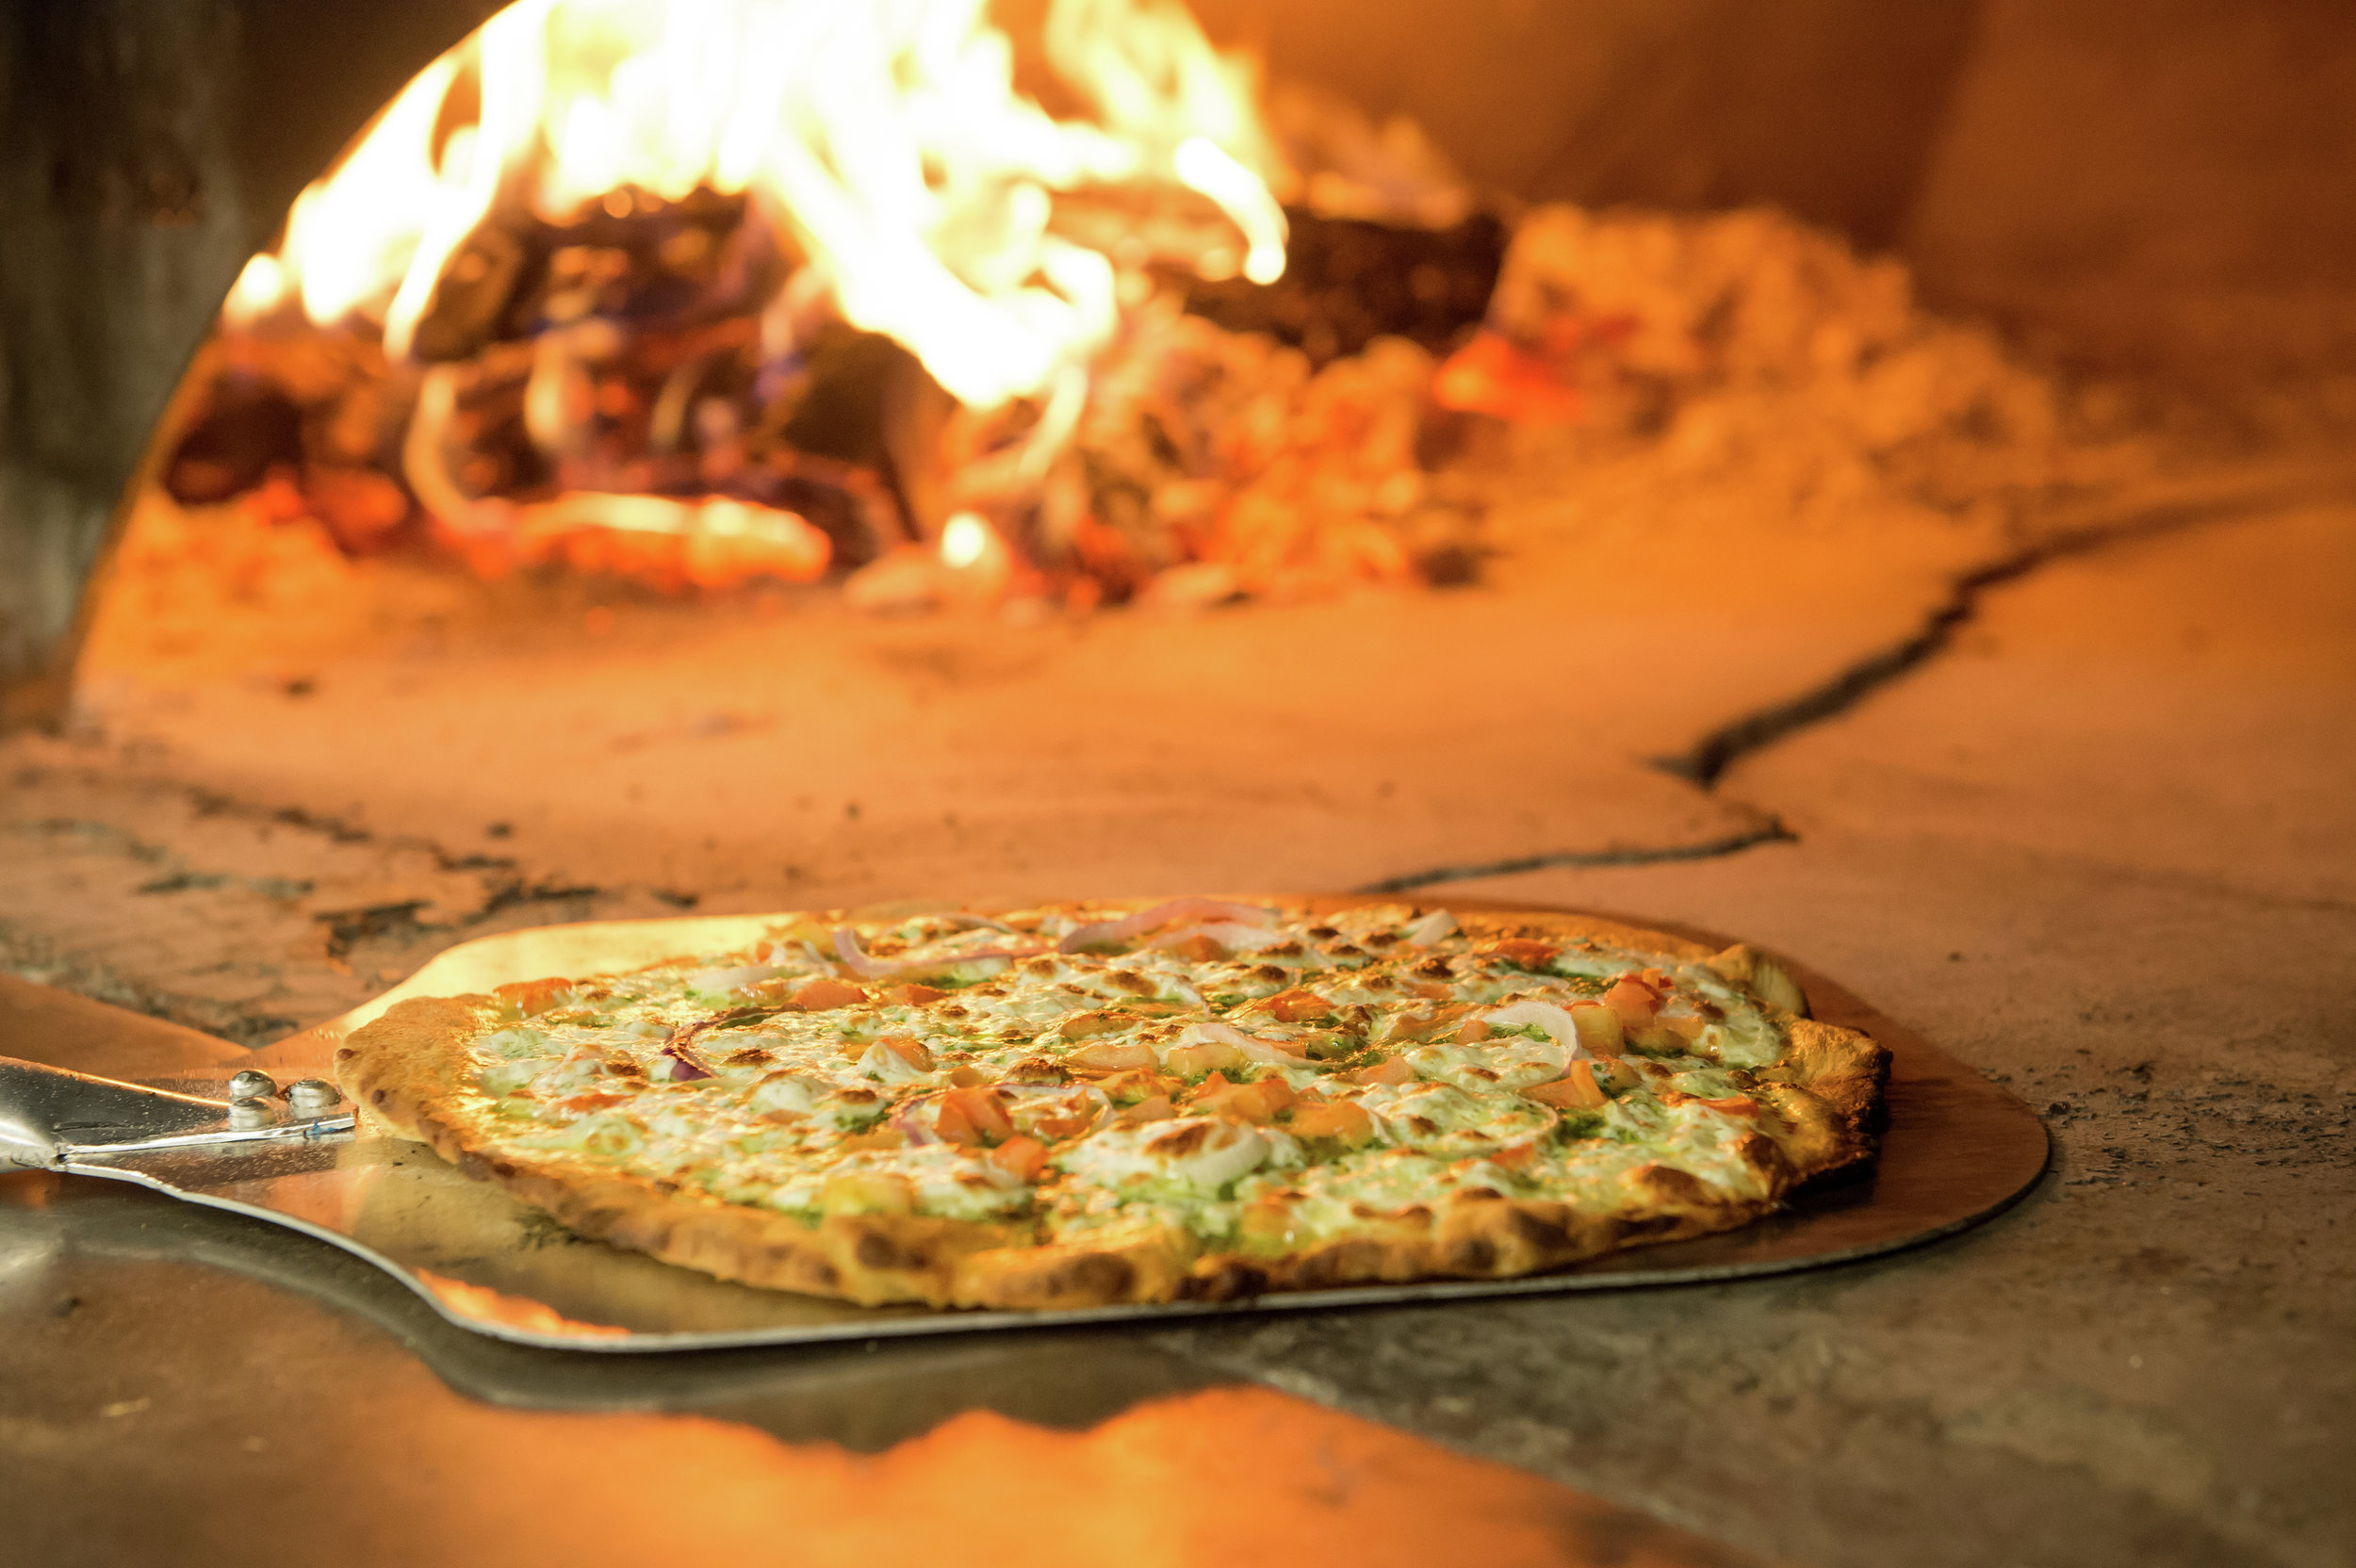 The Maxwell Hotel-Interiors-PBB-Pizza-Oven-Margarita-Pizza-3501x2329.jpg